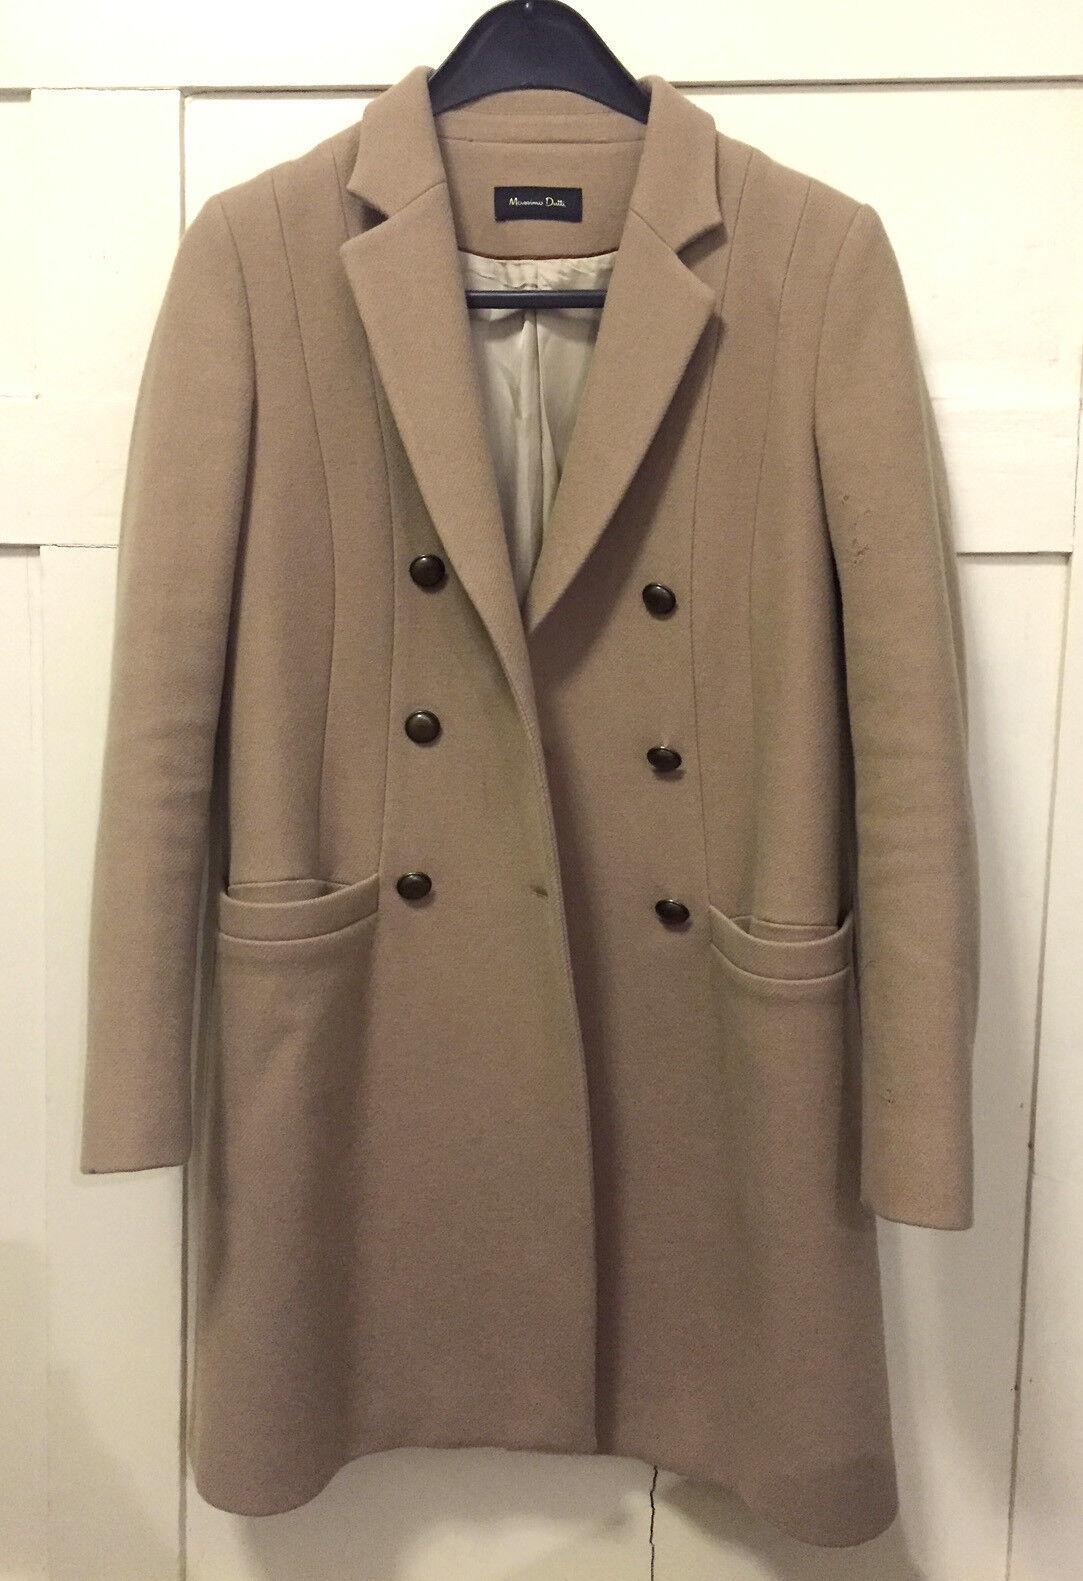 Massimo Dutti Beige Camel Wool coat SIZE 38